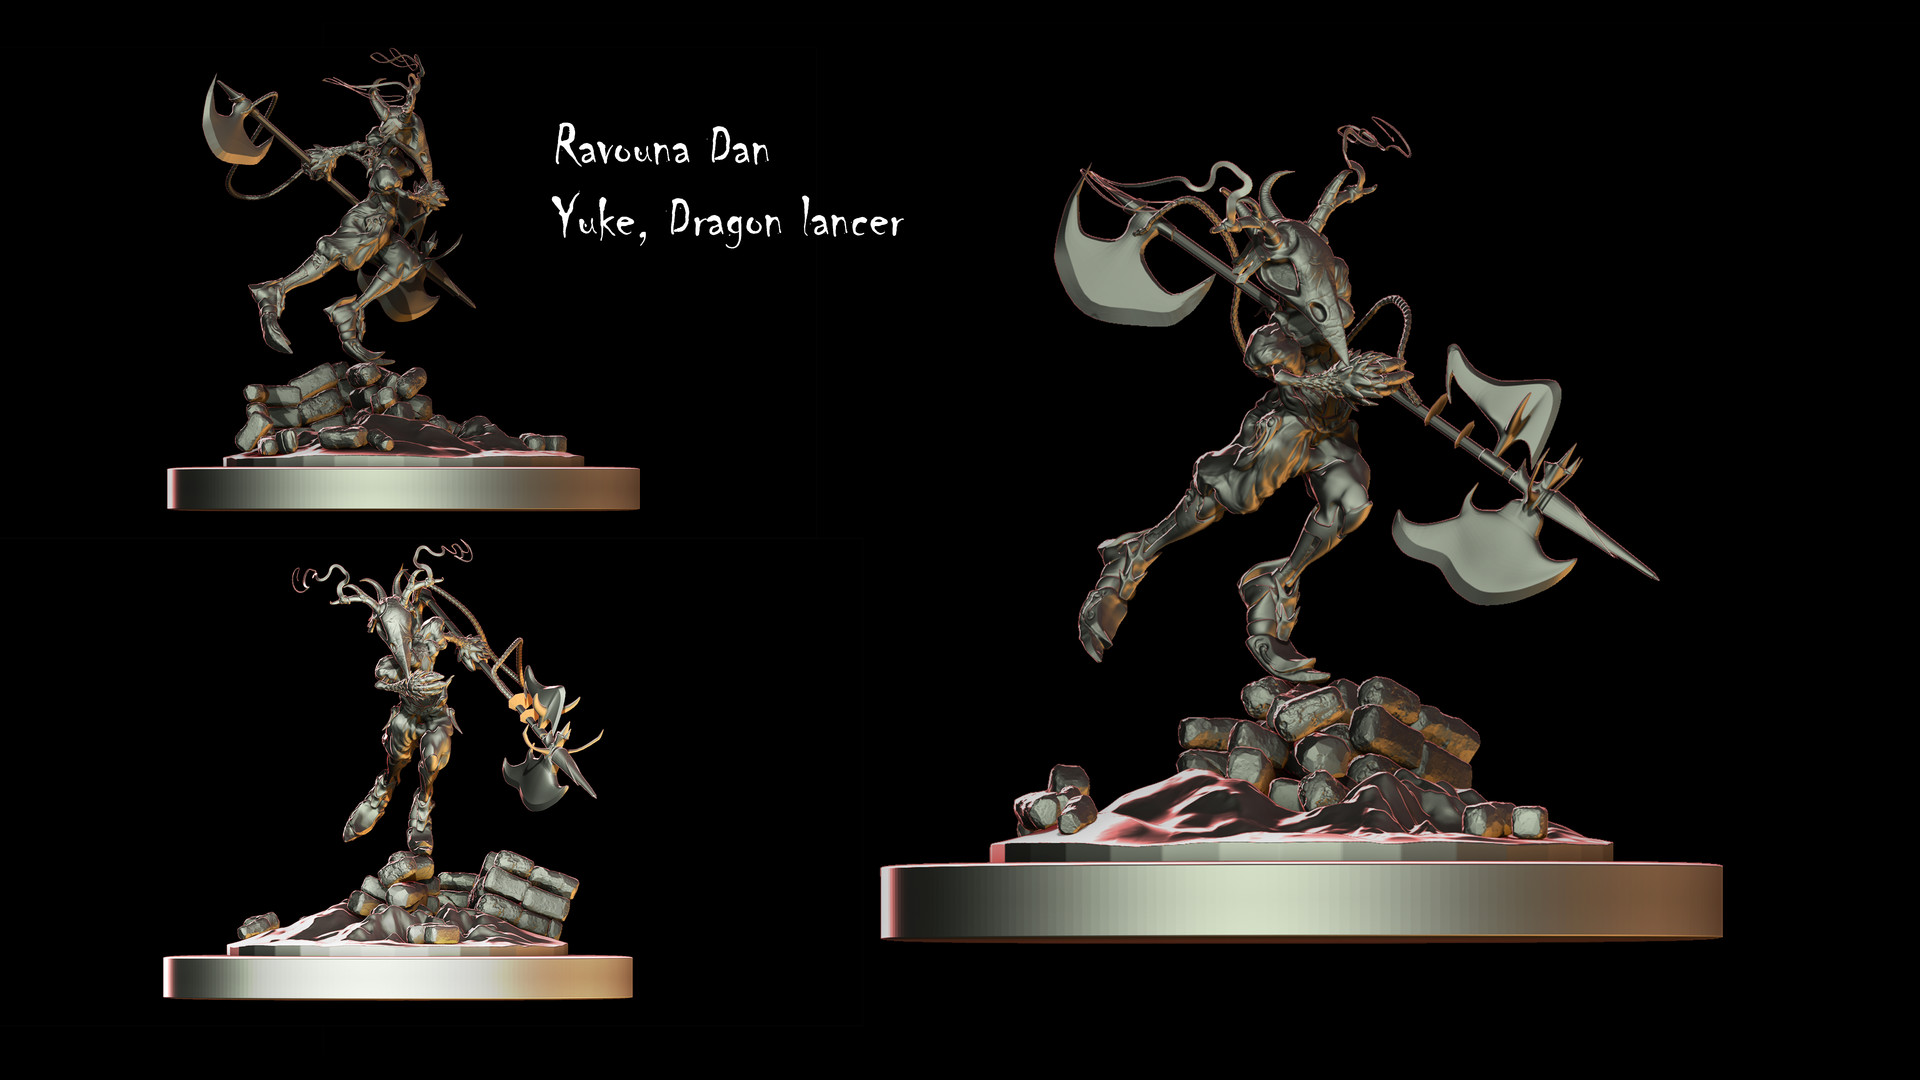 Dan Ravouna Yuke Dragon Knight Final Fantasy Crystal Chronicles